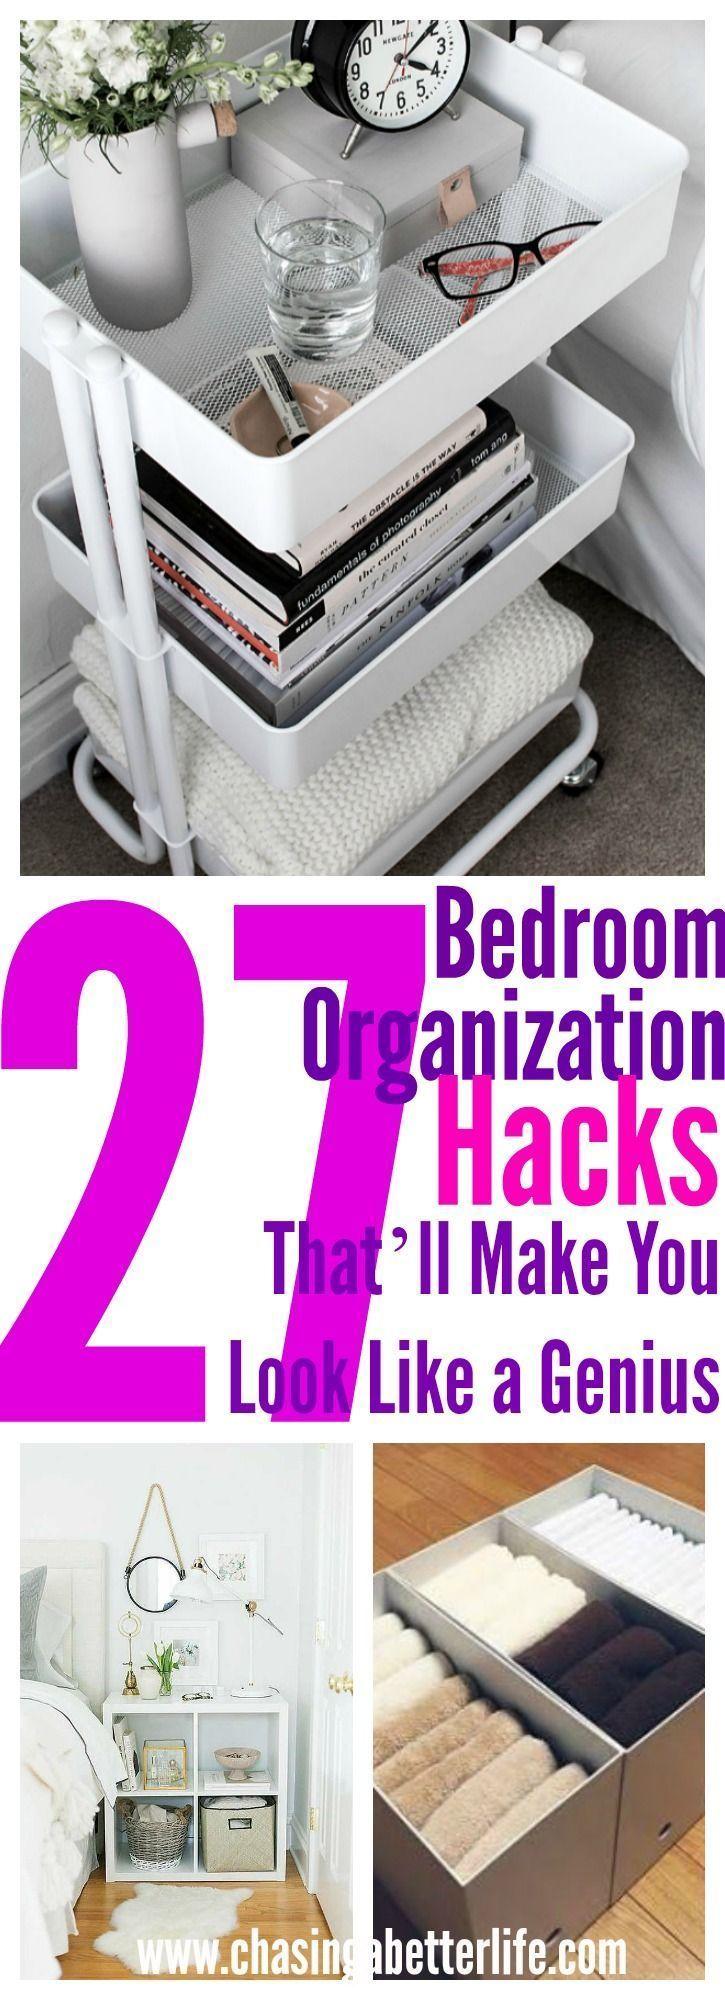 27 Bedroom Organization Hacks That'll Make You Look Like a Genius images